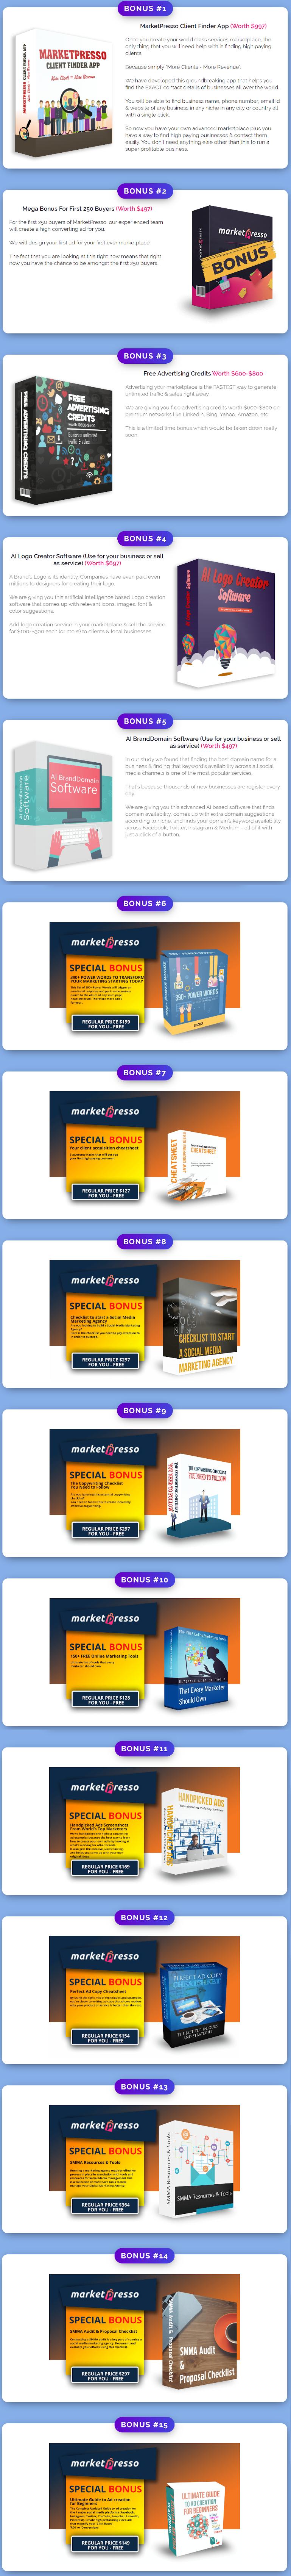 MarketPresso V2 Bonuses